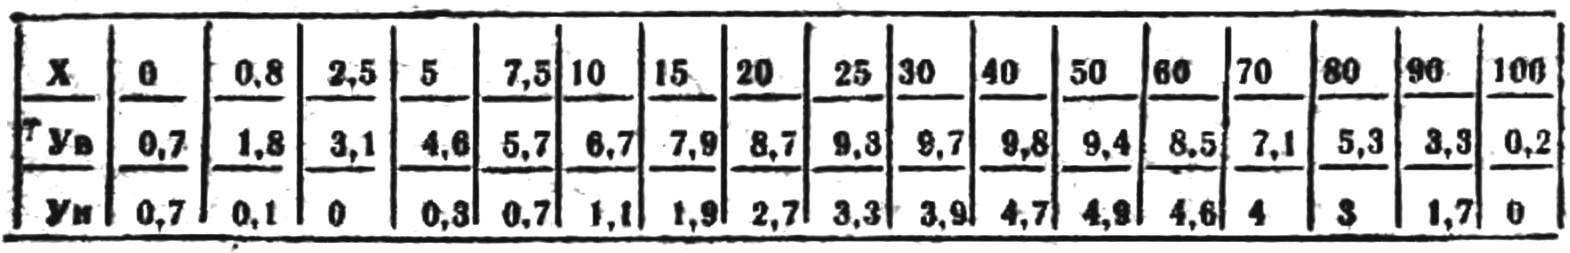 THE COORDINATES OF THE PROFILE OF AL/33